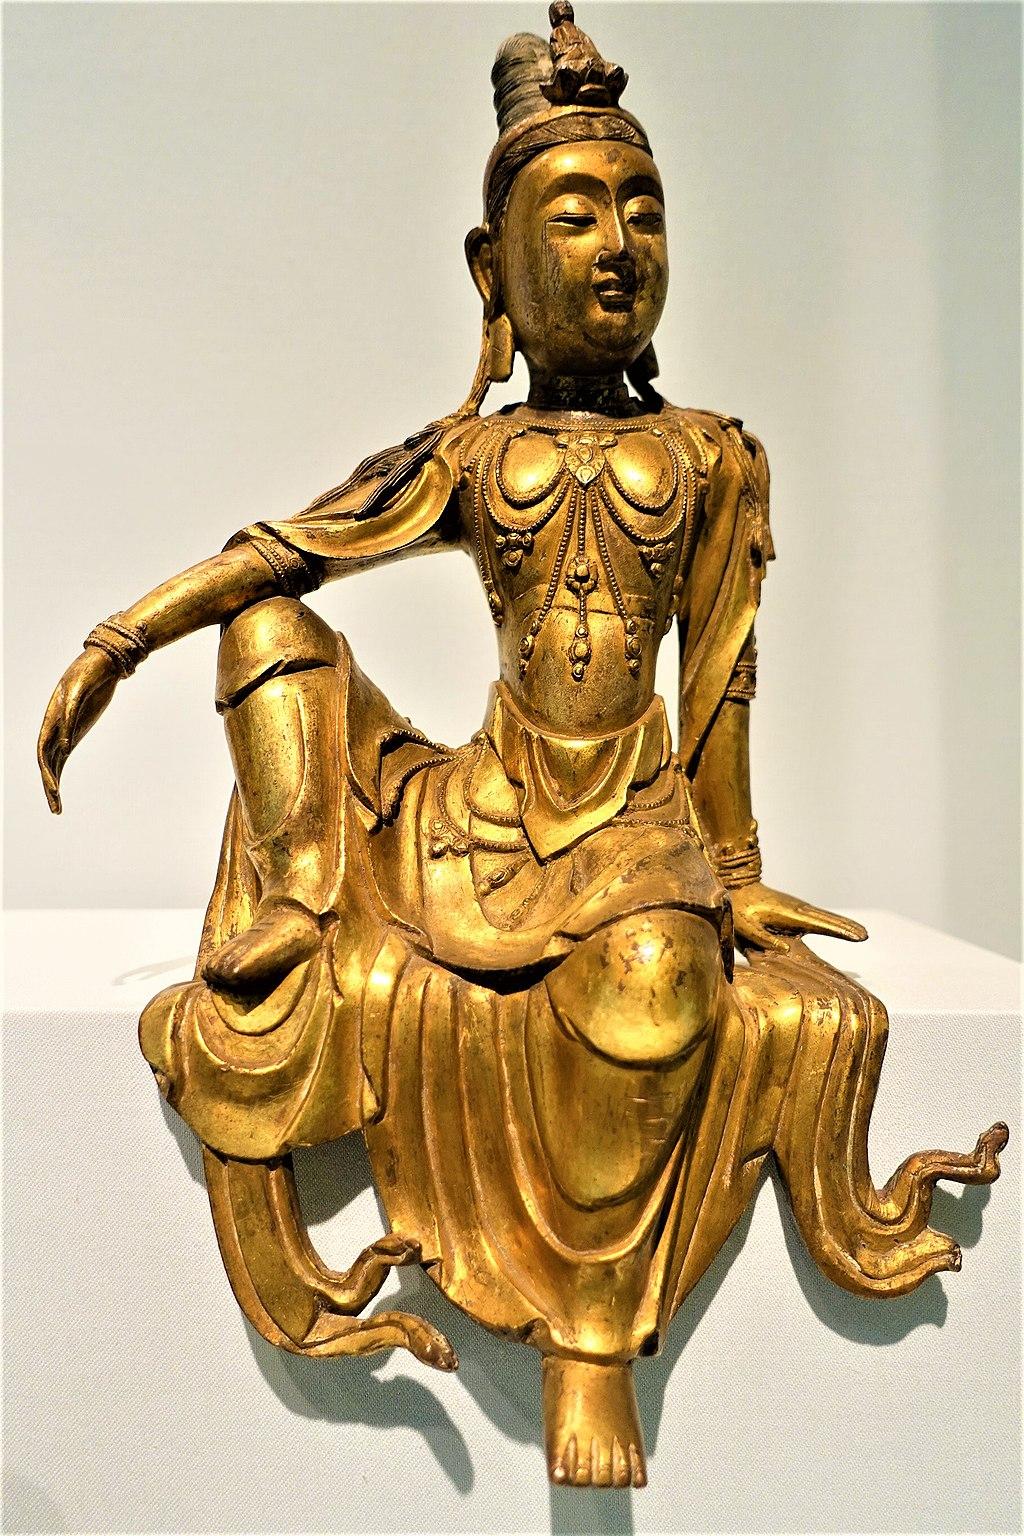 Seated Bodhisattva Avalokiteshvara - Guanyin (Asian Art Museum – San Francisco)